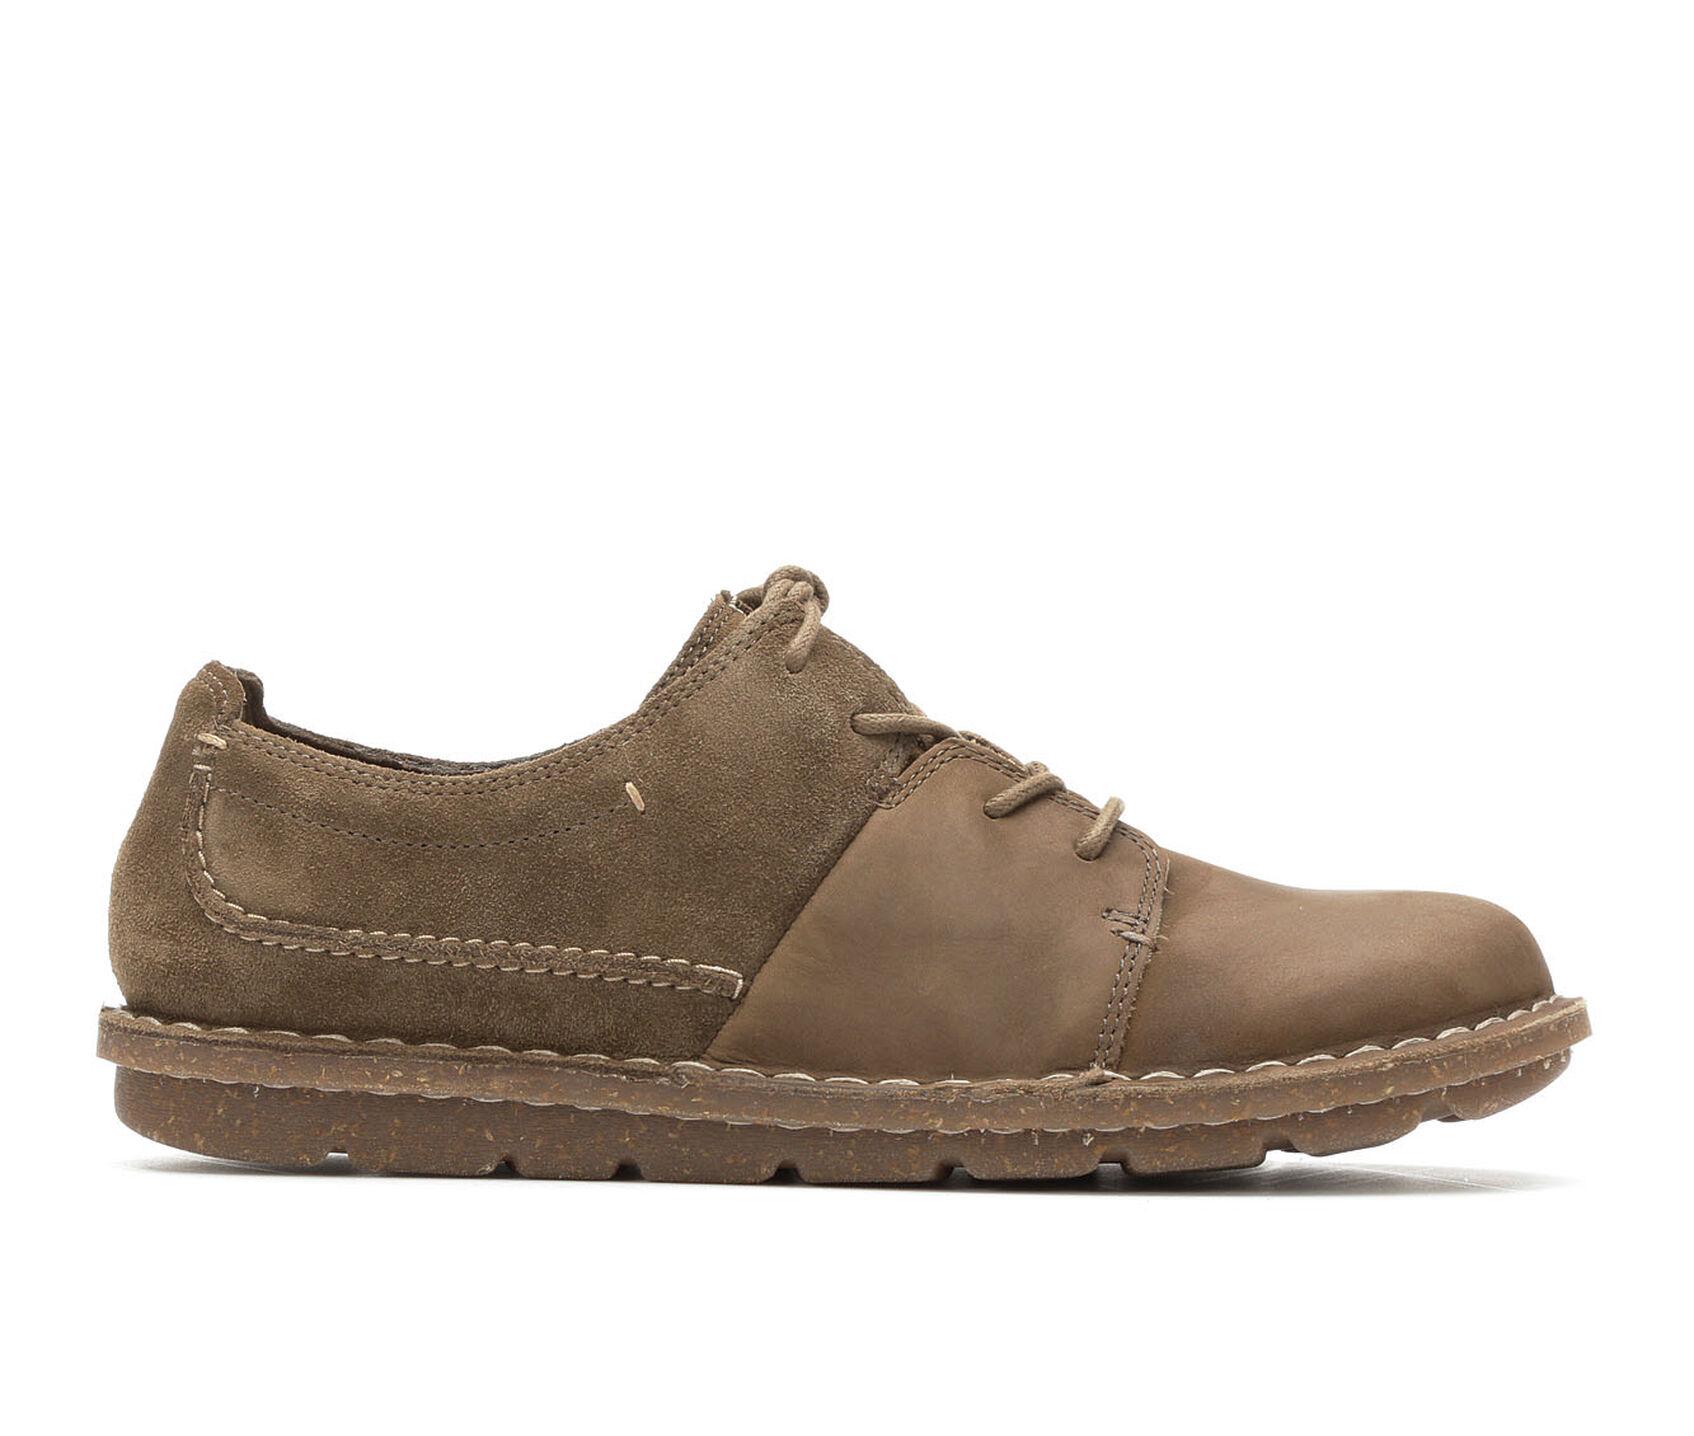 Clarks Shoes Women S Oxfords Style Guru Fashion Glitz